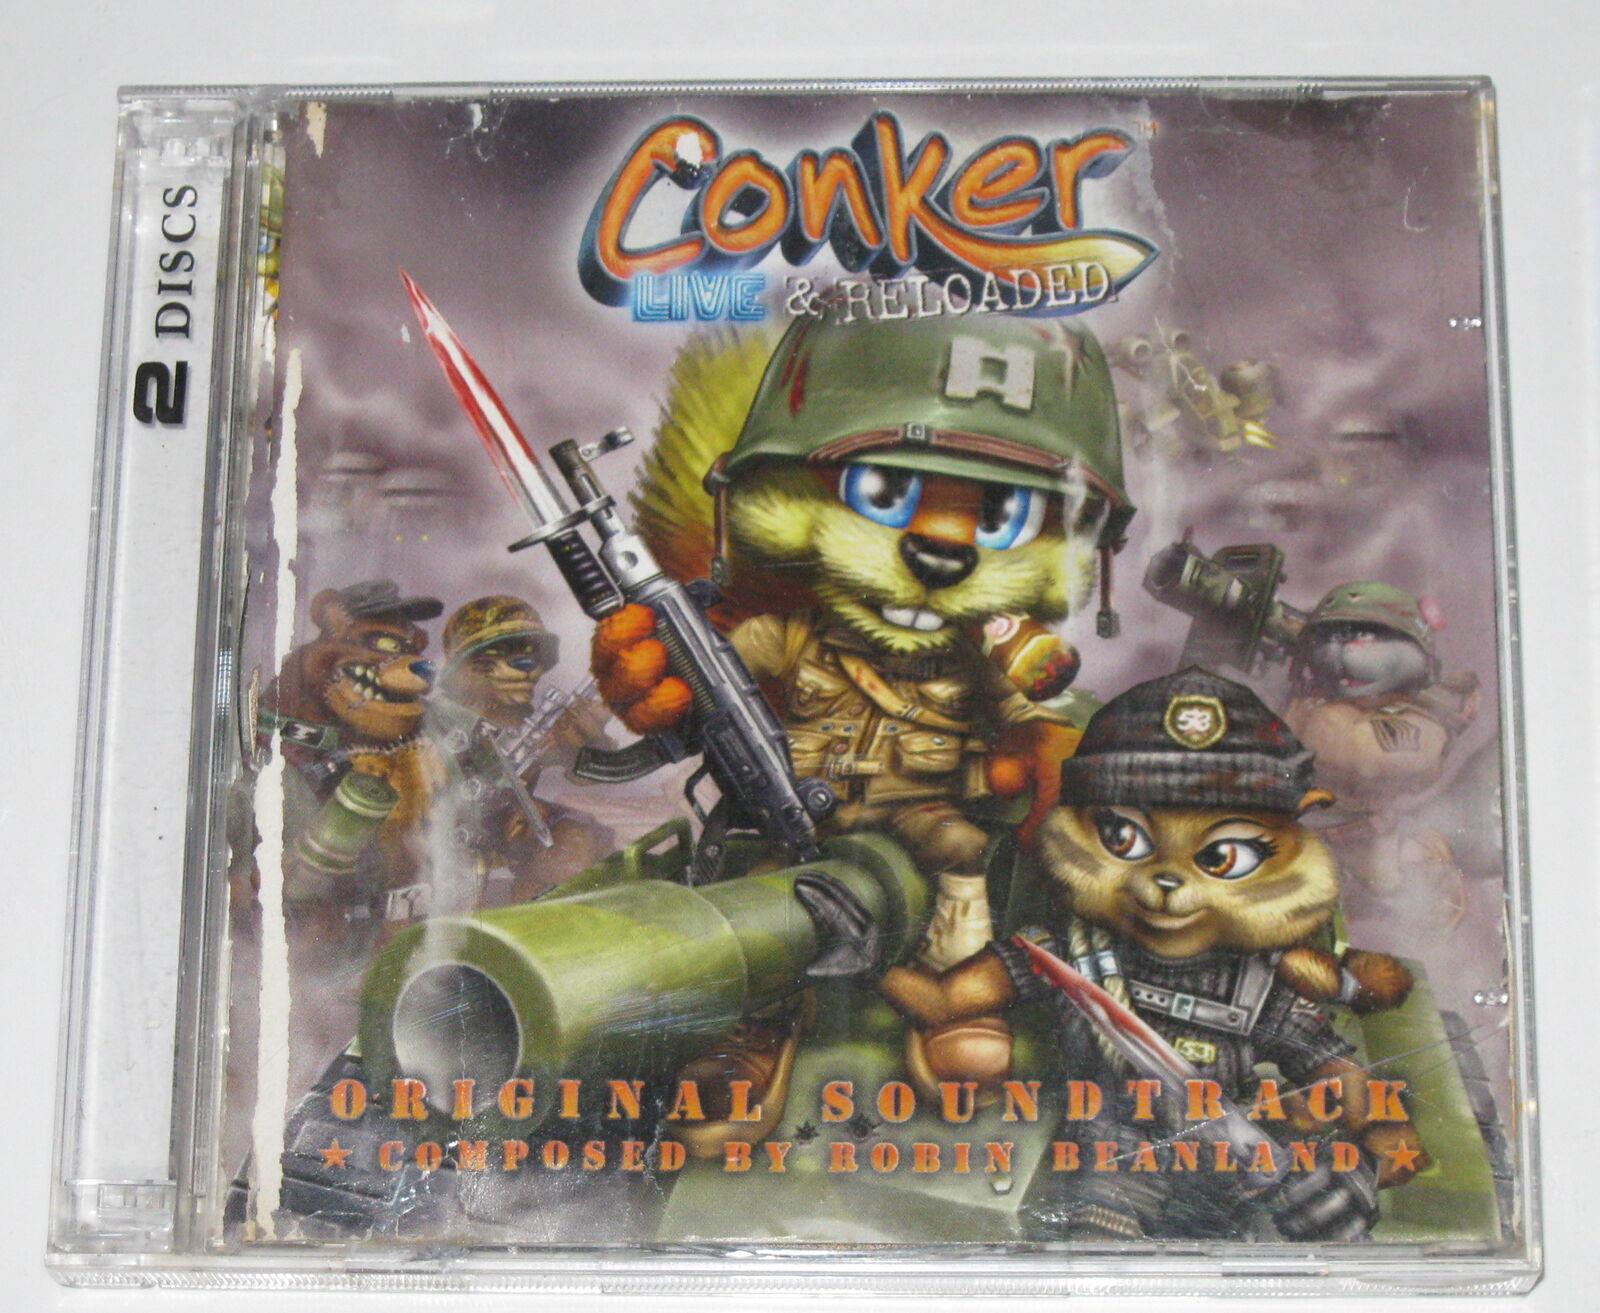 Conker Live Reloaded Original Soundtrack By Robin Beanland